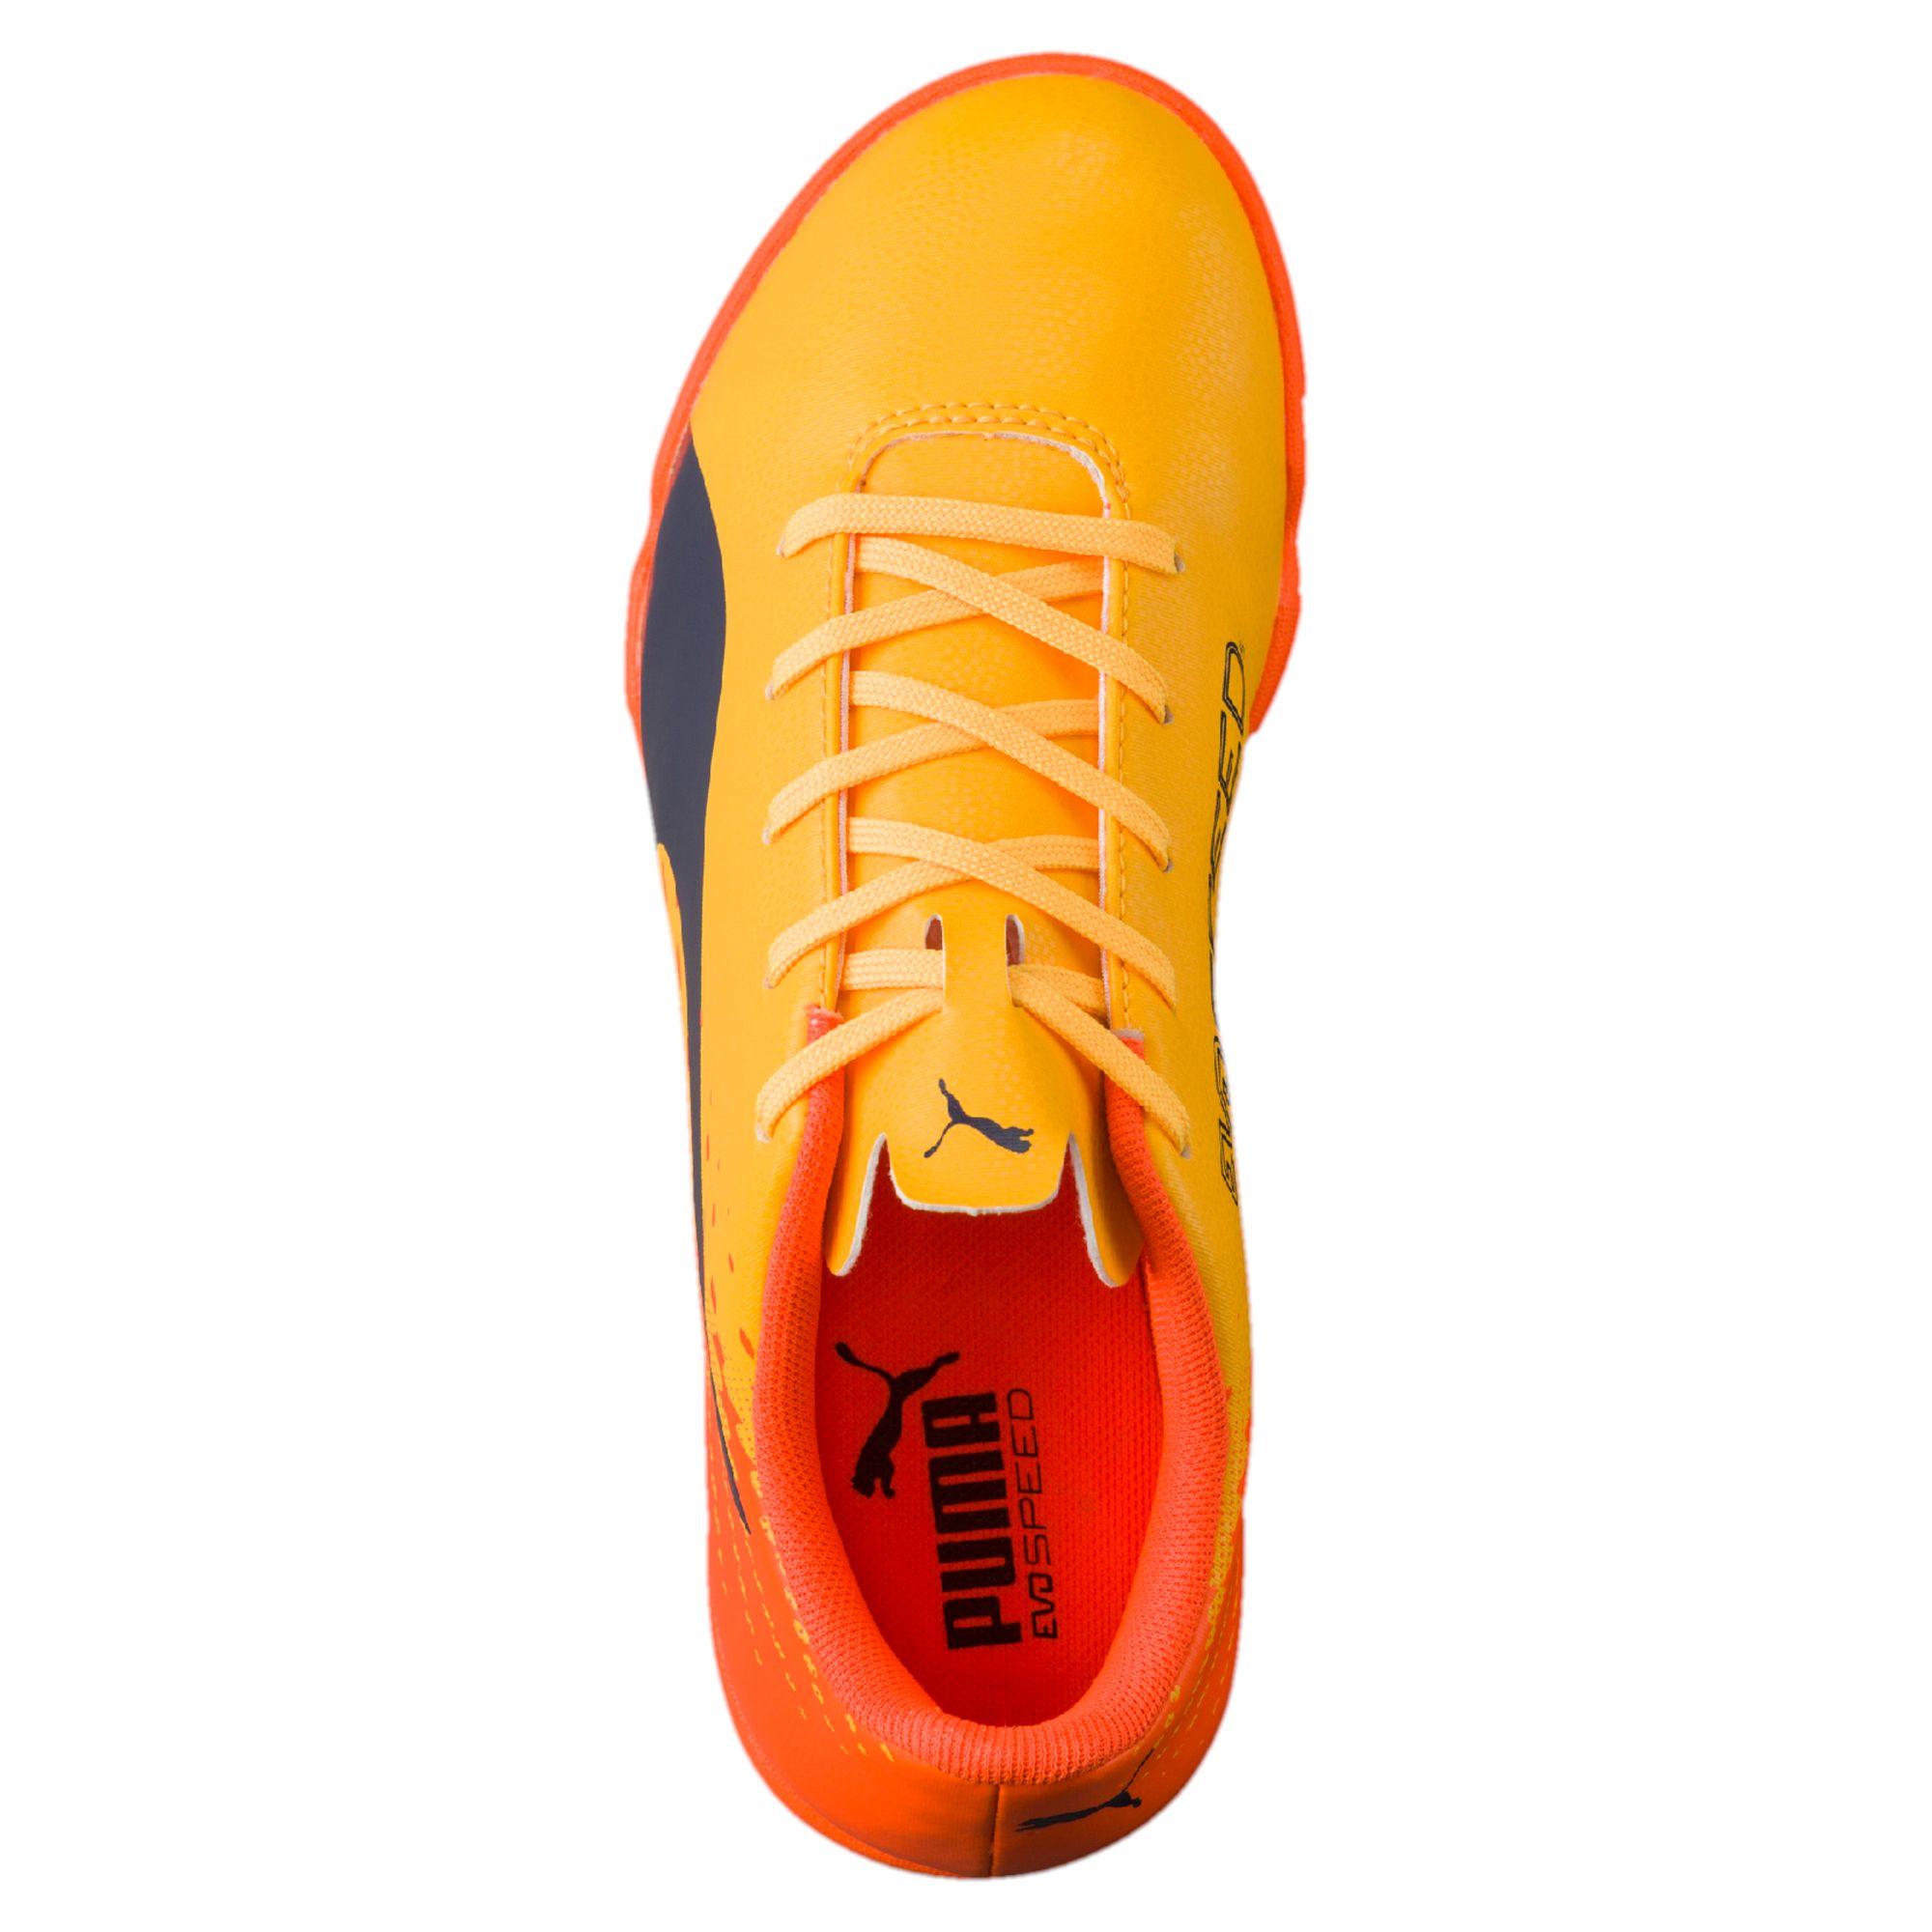 PUMA evoSPEED 17.5 TT Kinder Fußballschuhe Fußball Schuhe Unisex Unisex Schuhe Neu 9df956